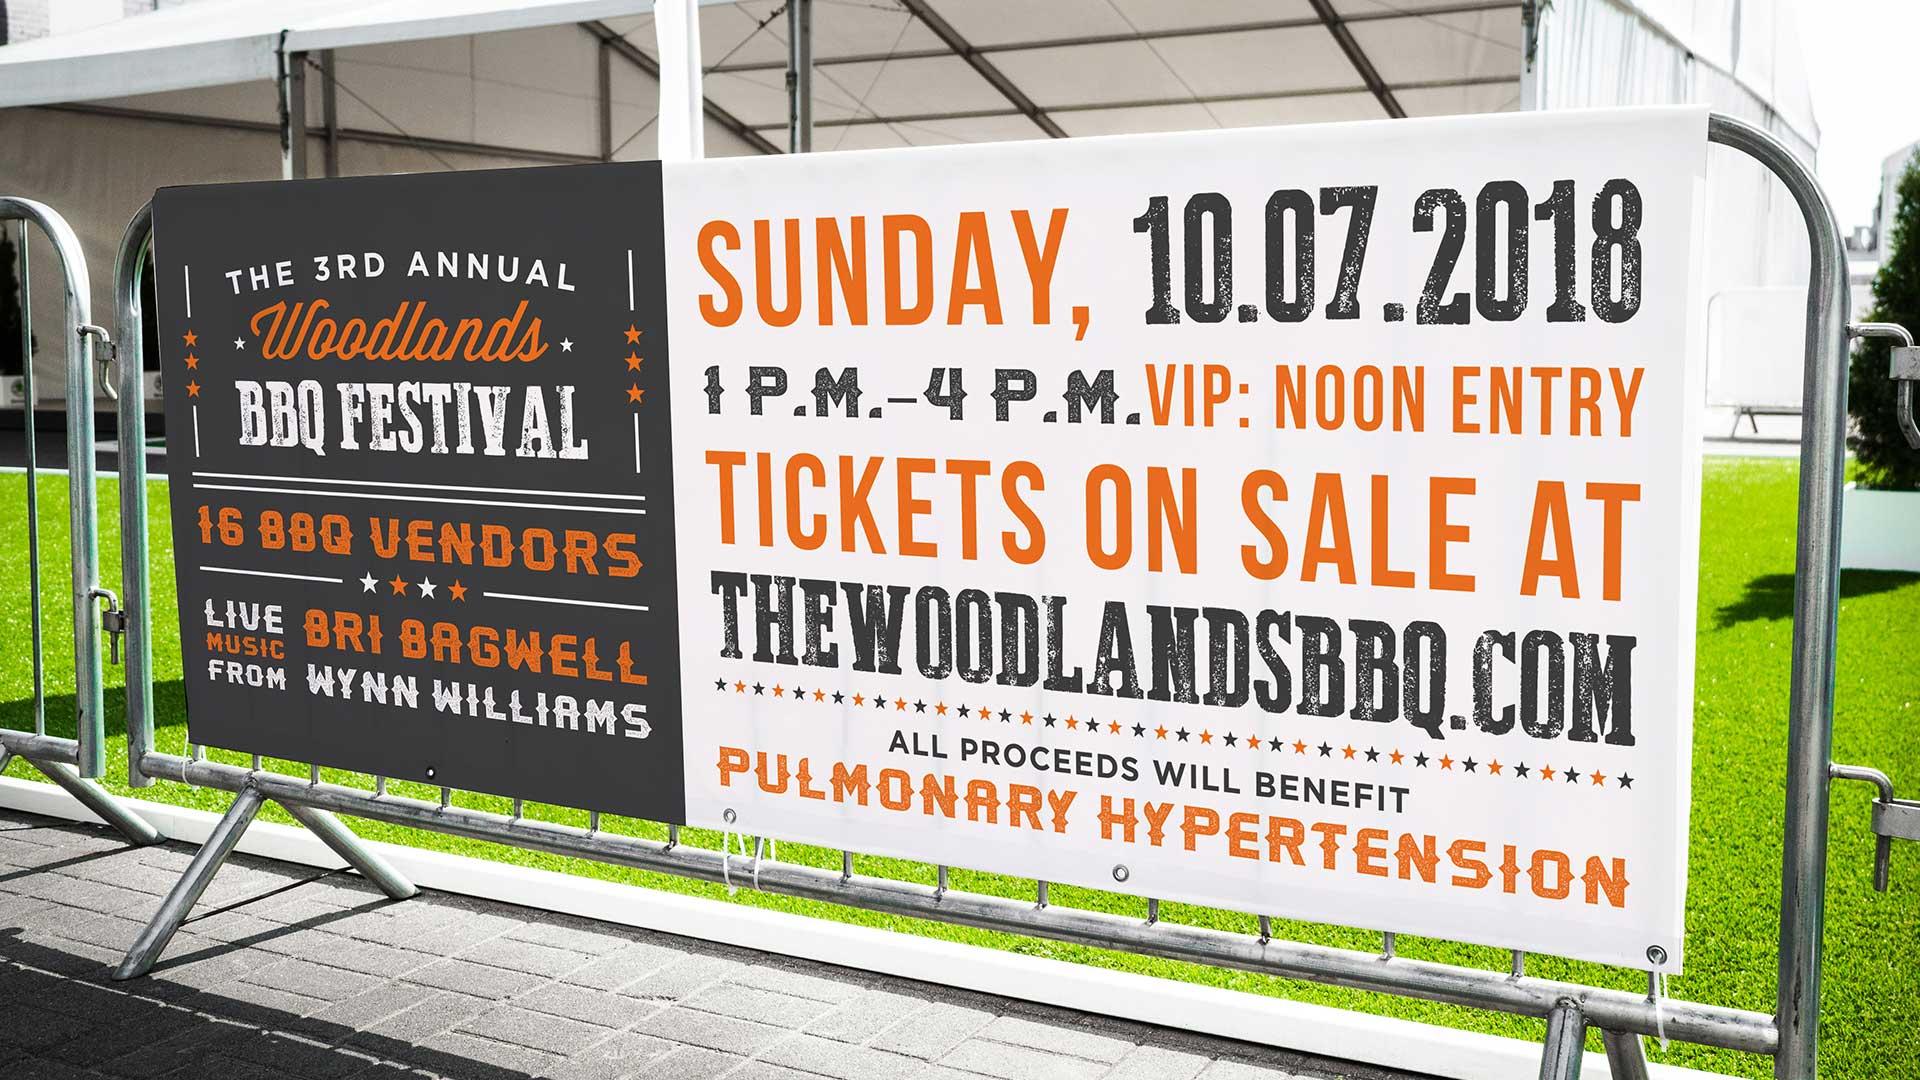 Woodlands BBQ Festival Banner 1920x1080 1